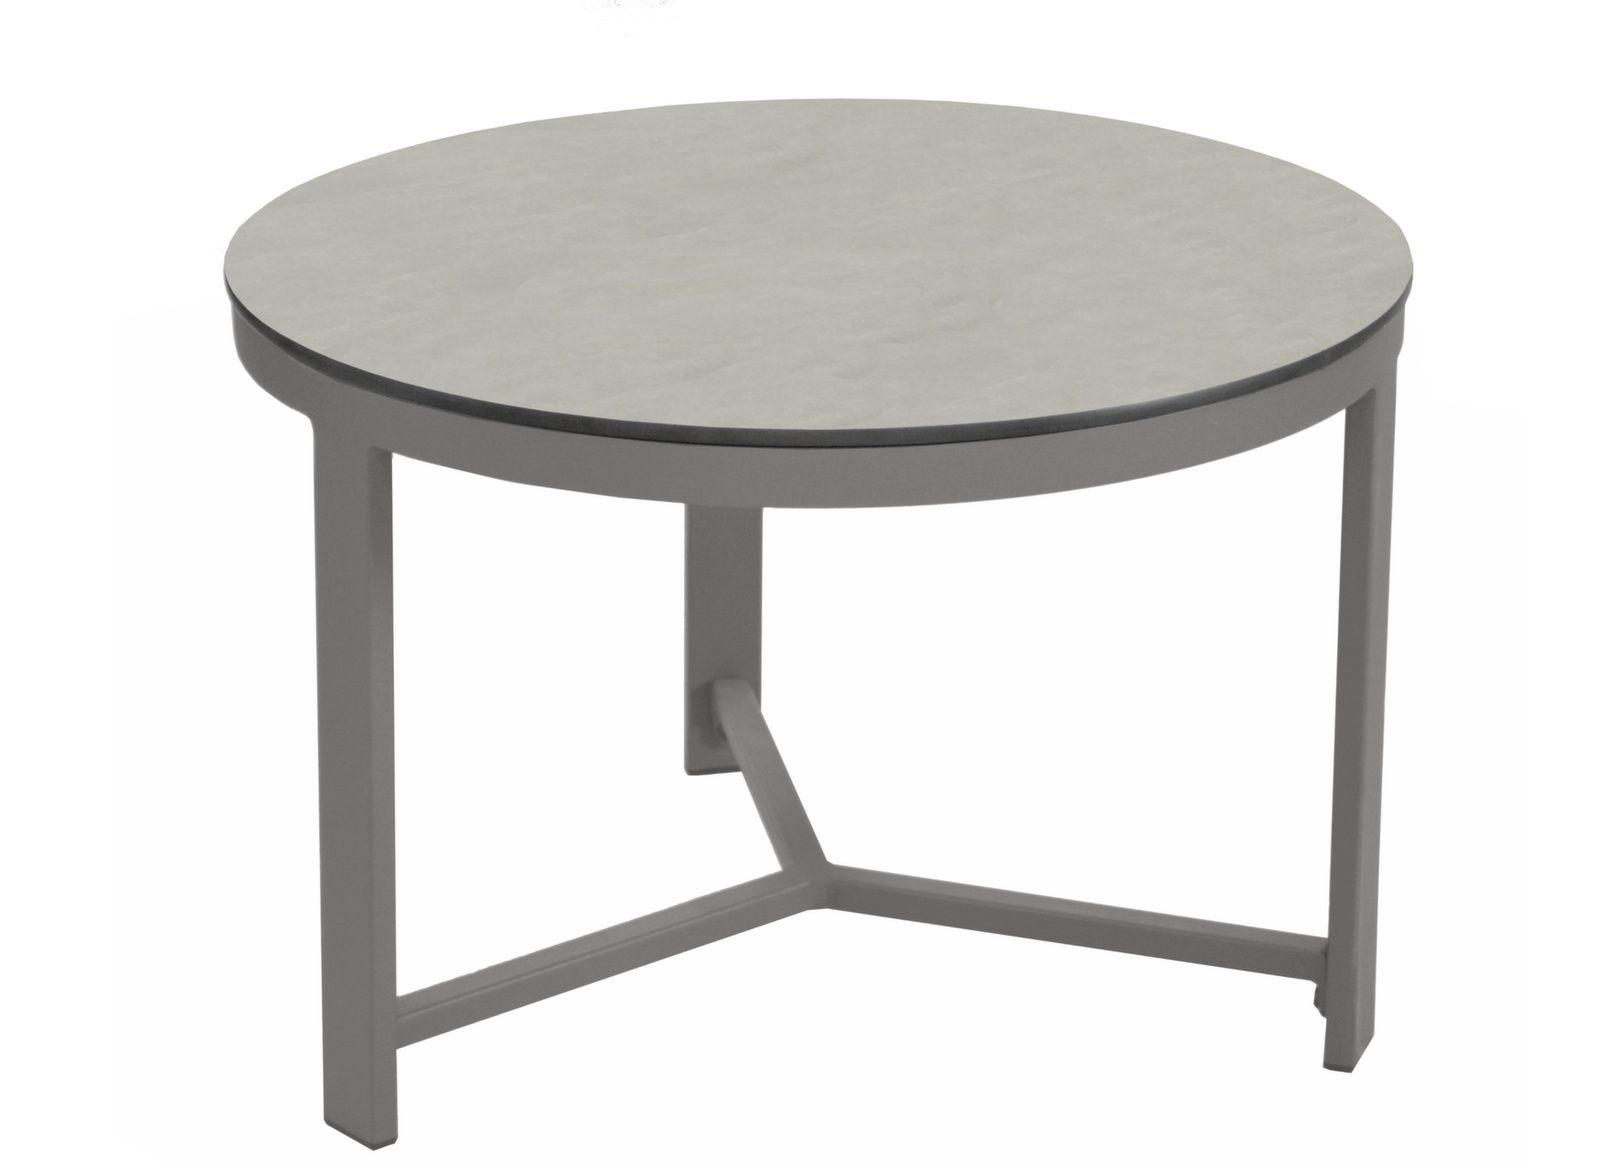 table basse augusta 60 cm plateau hpl tables basses proloisirs. Black Bedroom Furniture Sets. Home Design Ideas